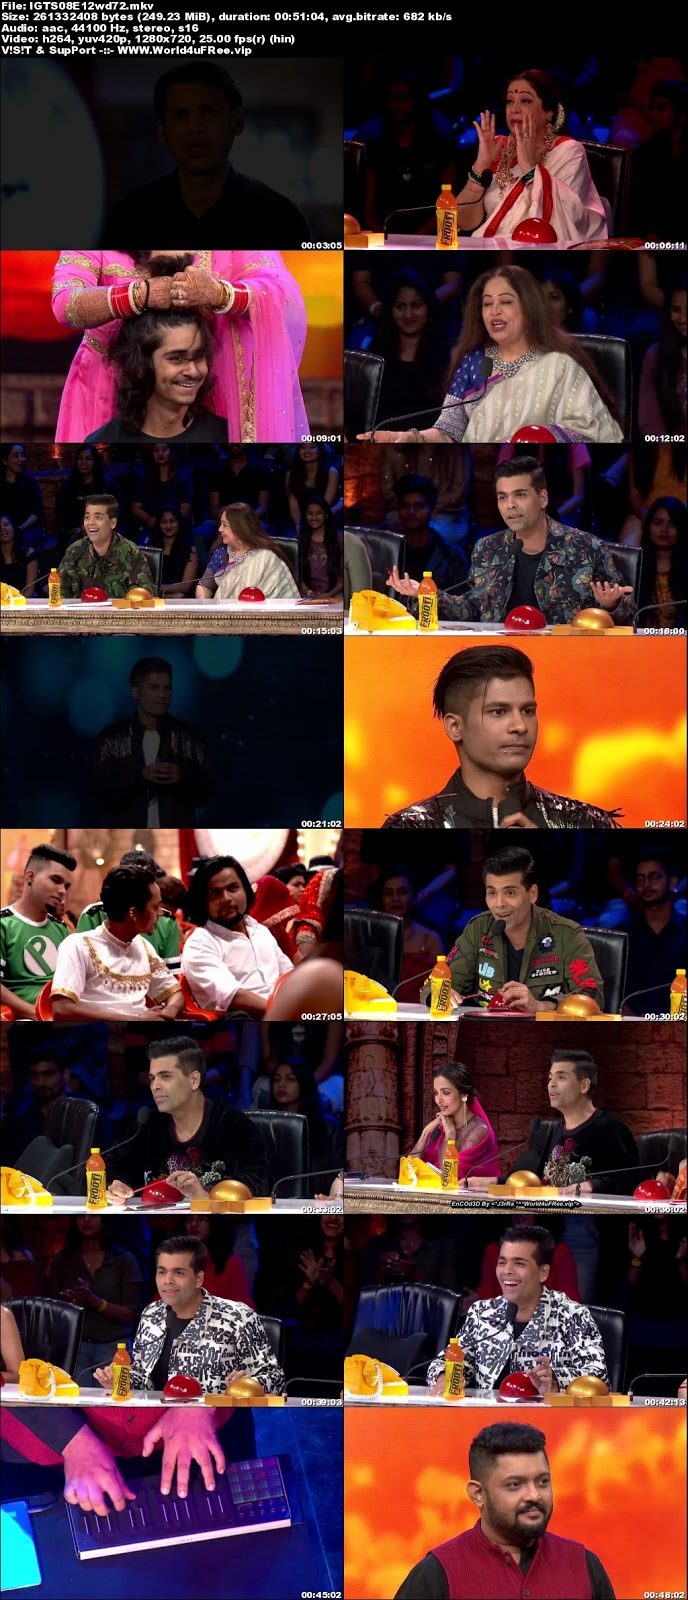 India's Got Talent S08 Episode 12 720p WEBRip 250mb x264 world4ufree.viptv show India's Got Talent Season 8 Star Plus tv show HD 720p free download or watch online at world4ufree.vip